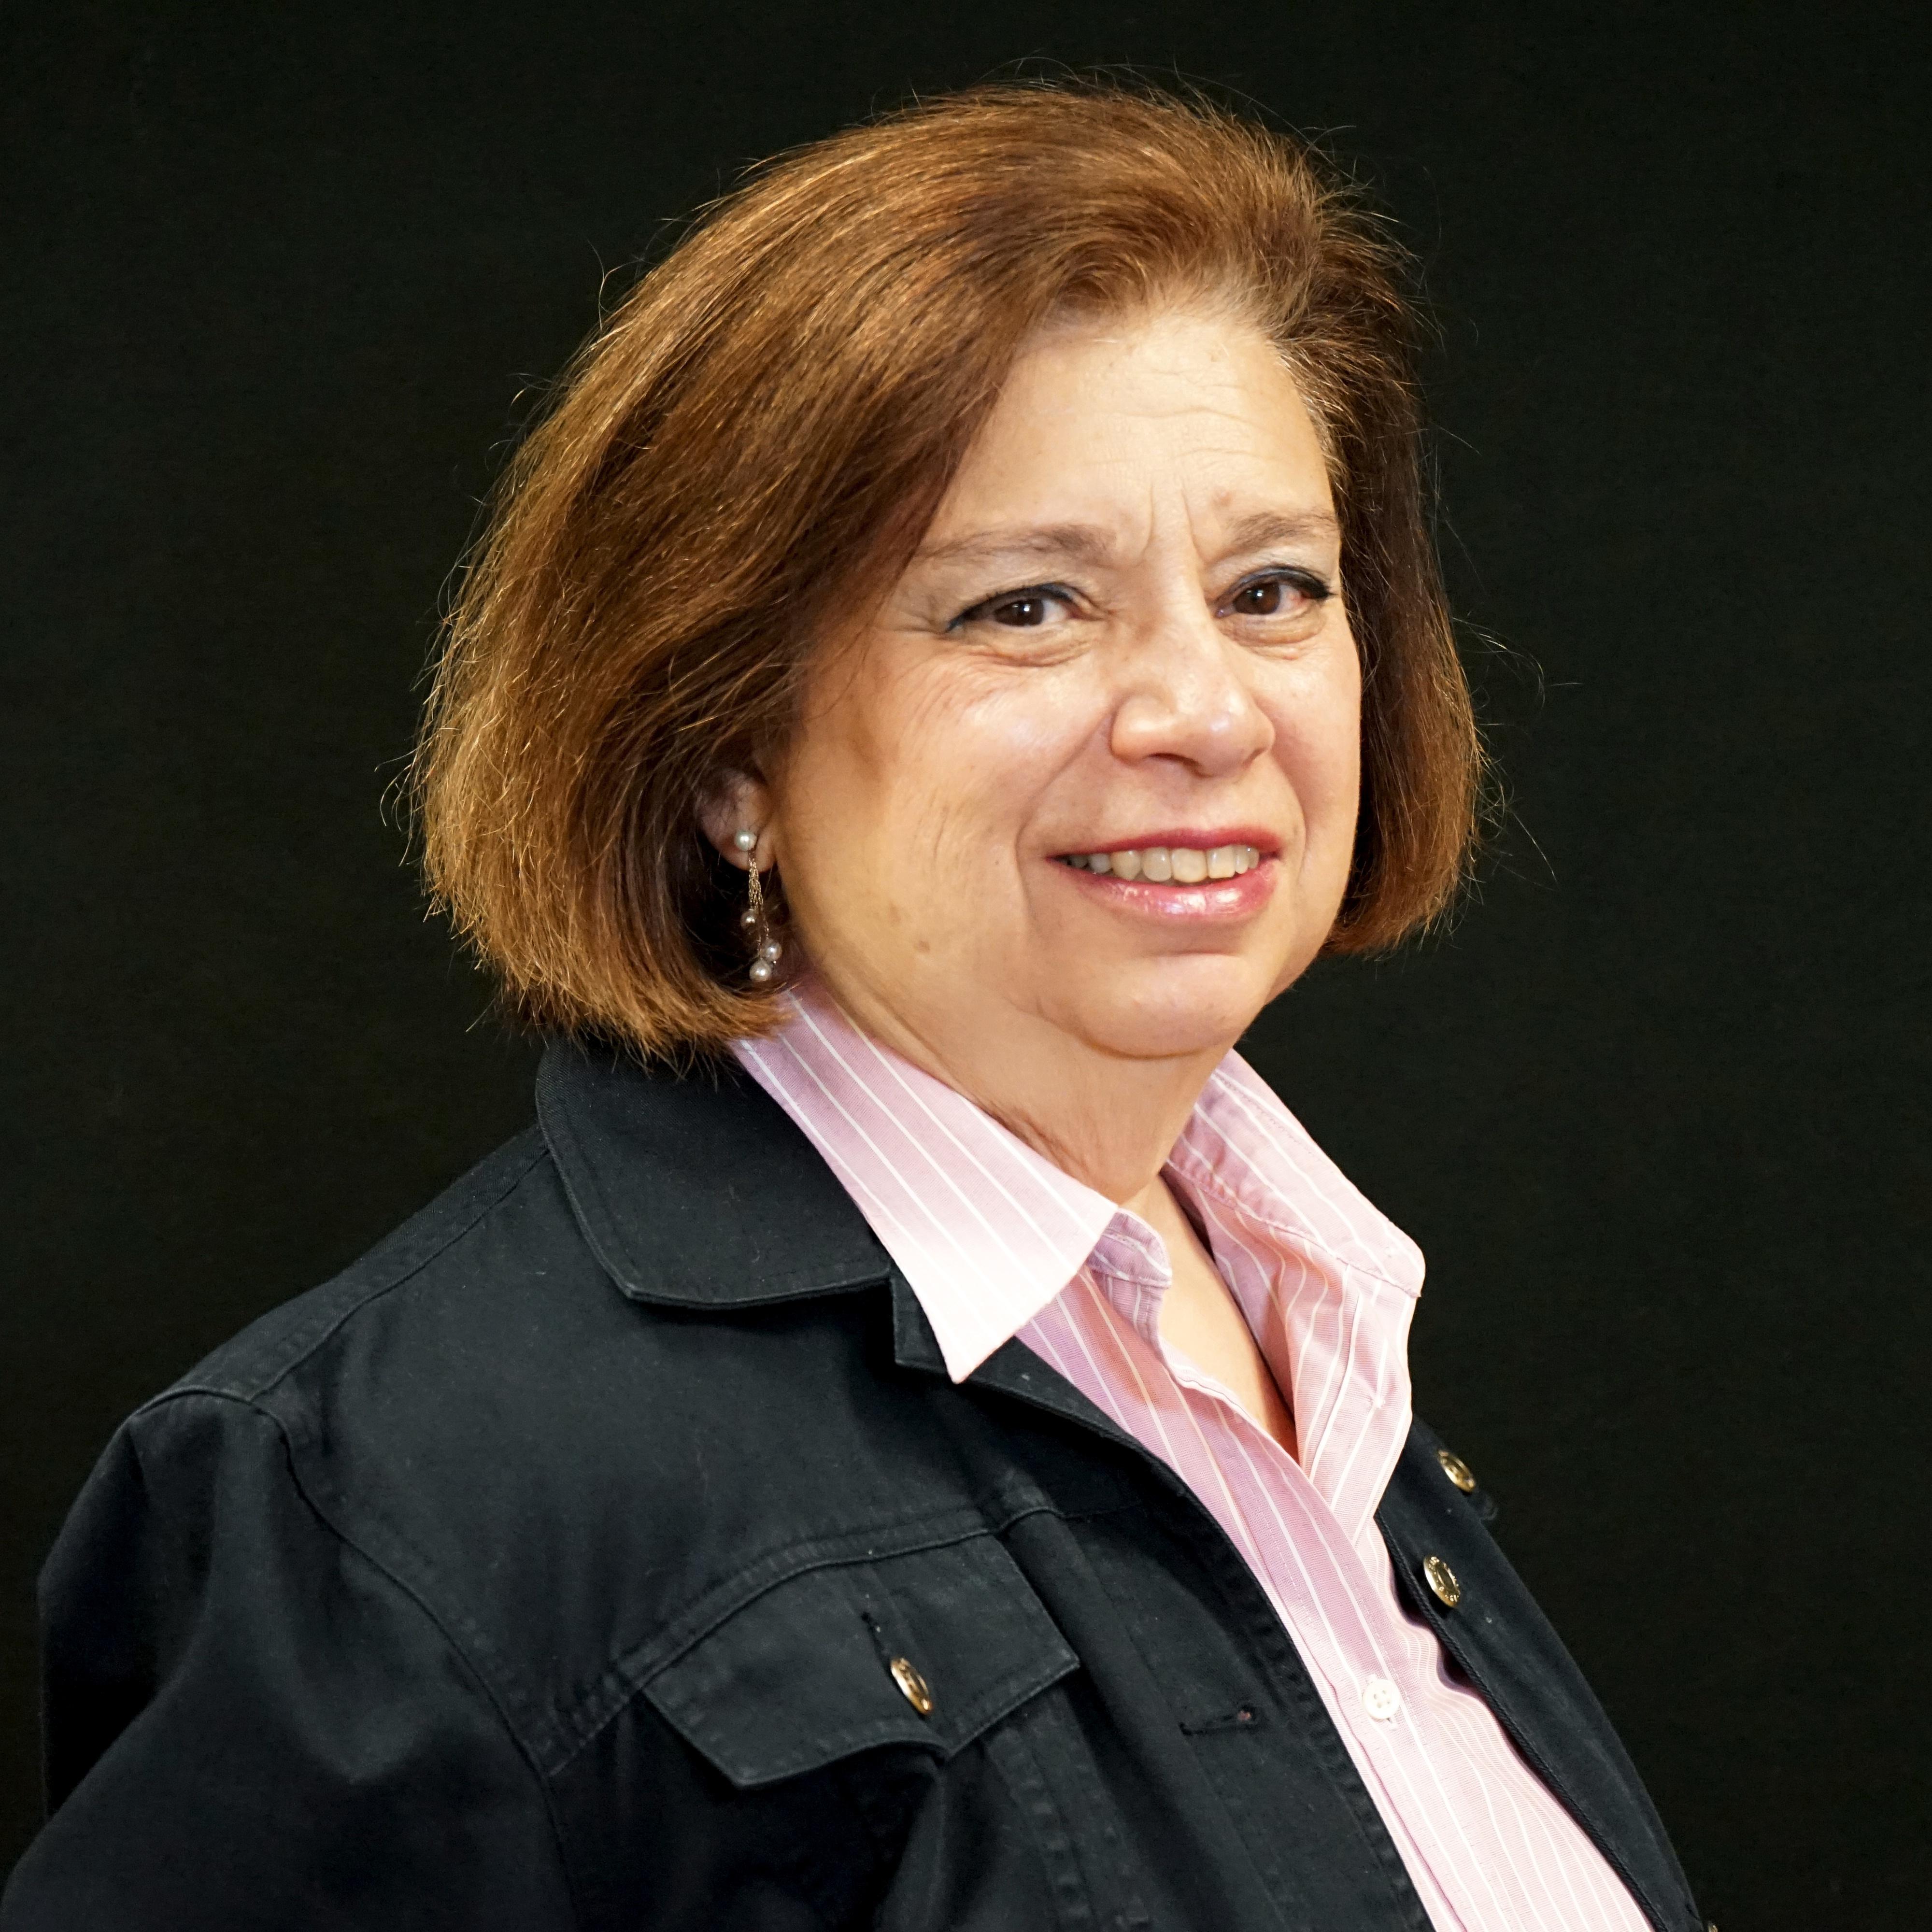 Susan Moschella